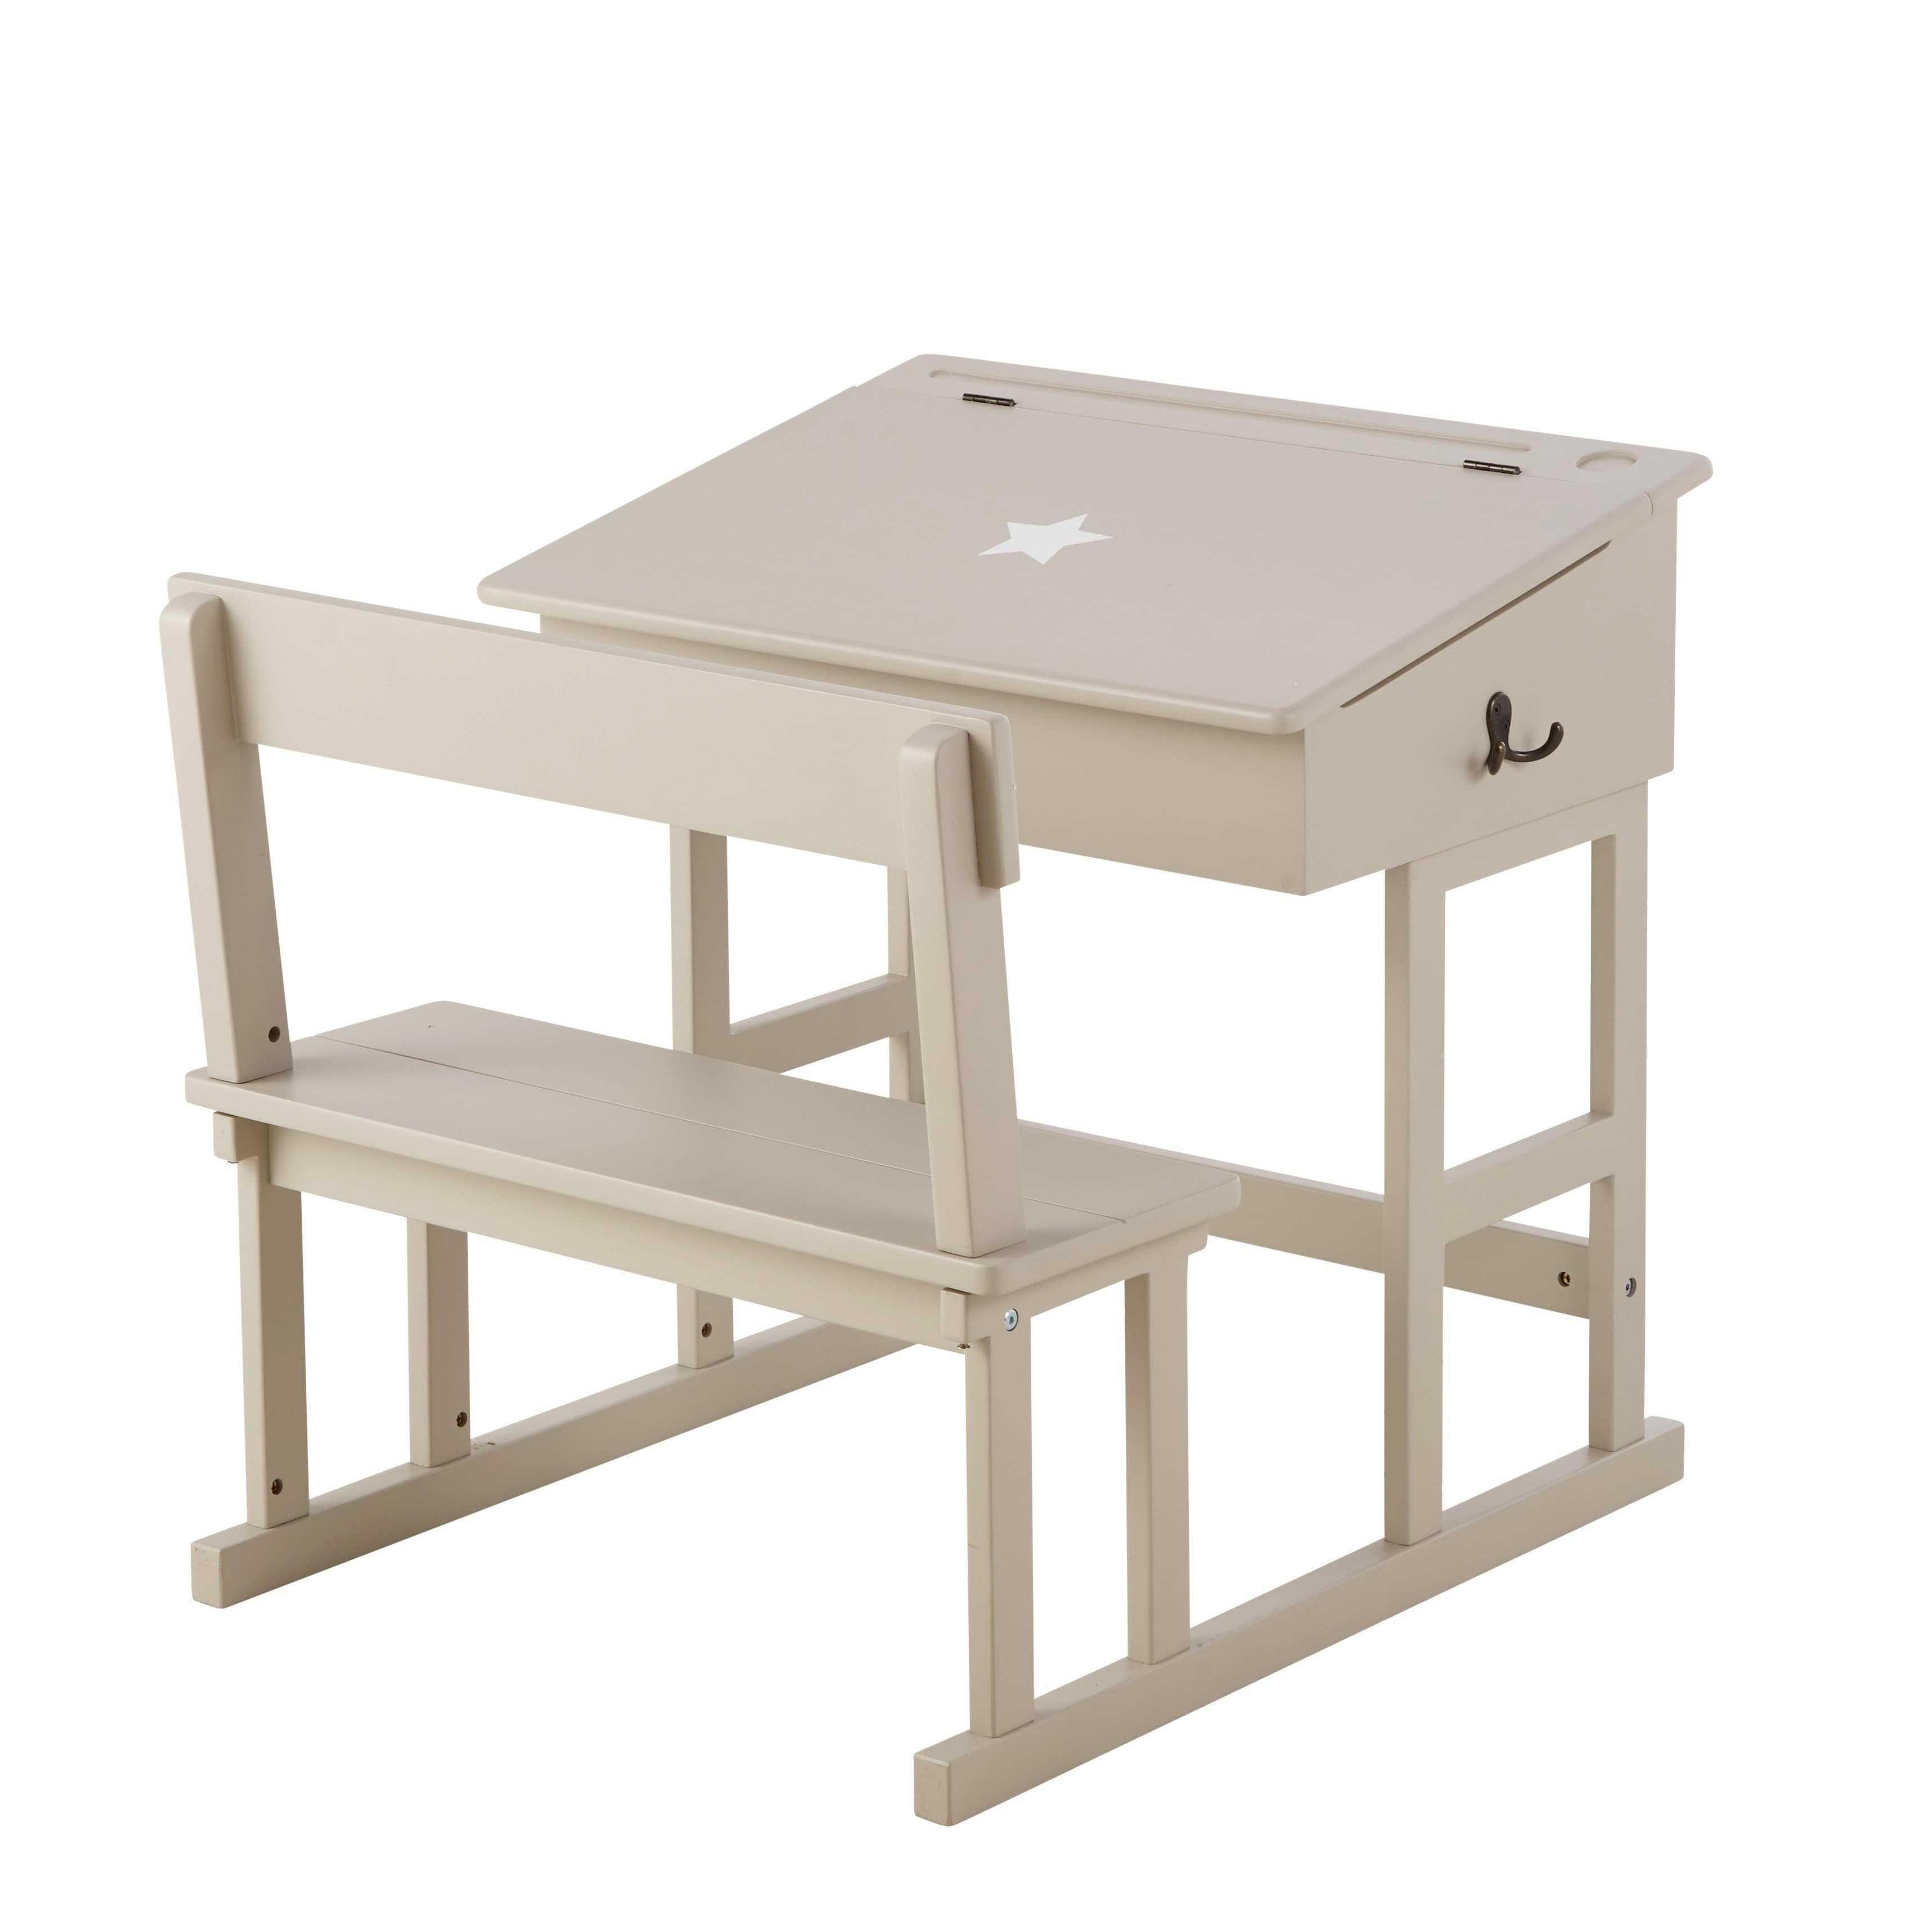 kinderschreibtisch pult taupe kinderzimmer pinterest kinderzimmer kinder zimmer und. Black Bedroom Furniture Sets. Home Design Ideas